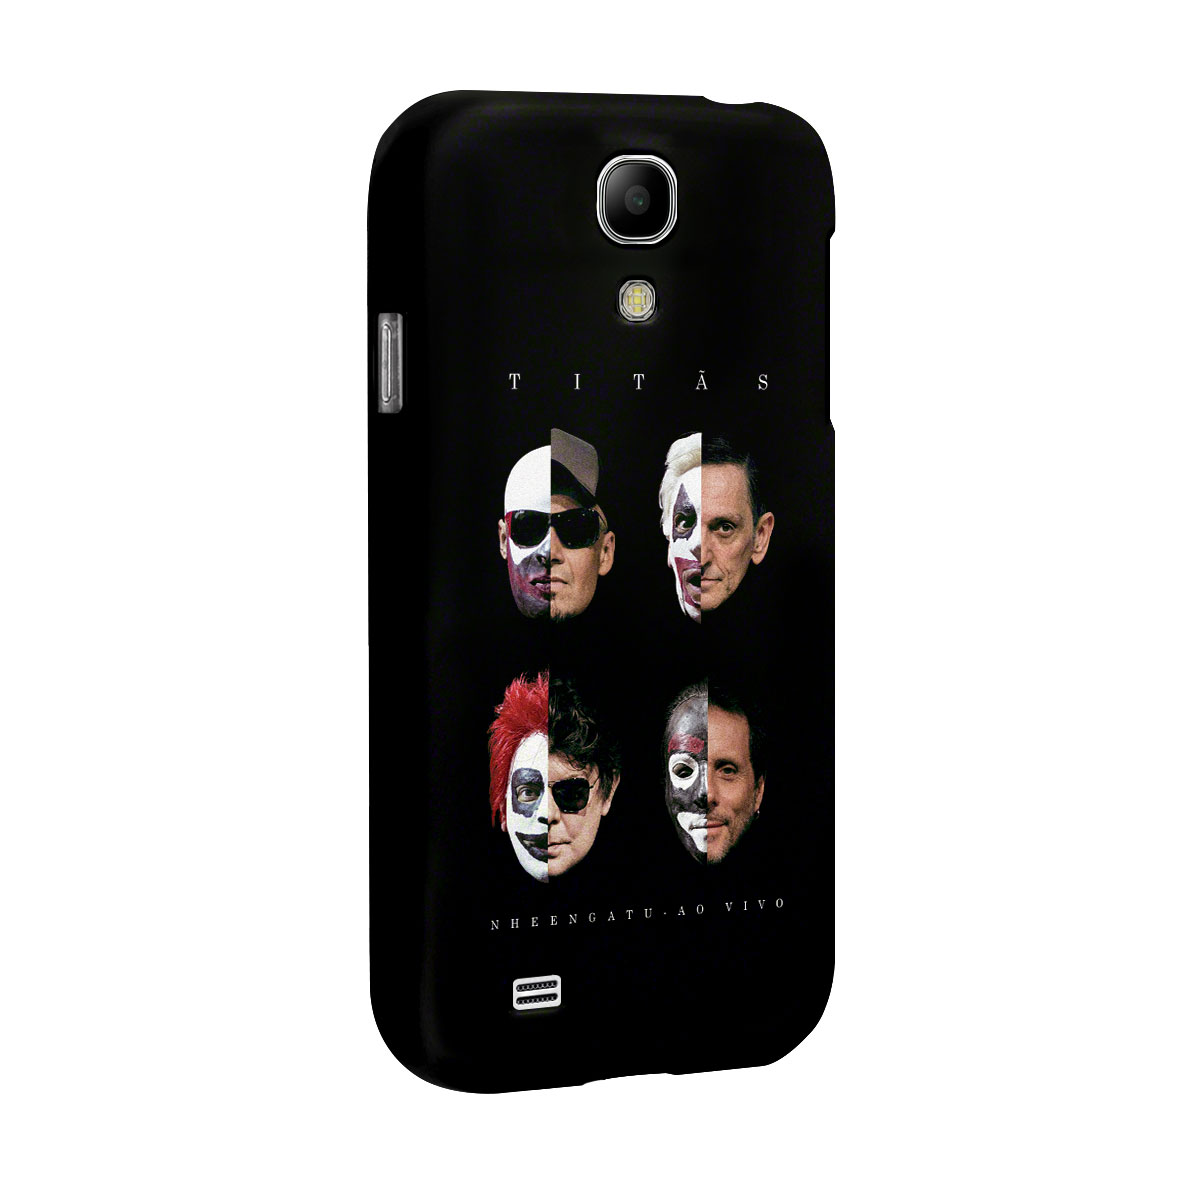 Capa para Samsung Galaxy S4 Titãs Capa Nheengatu Ao Vivo